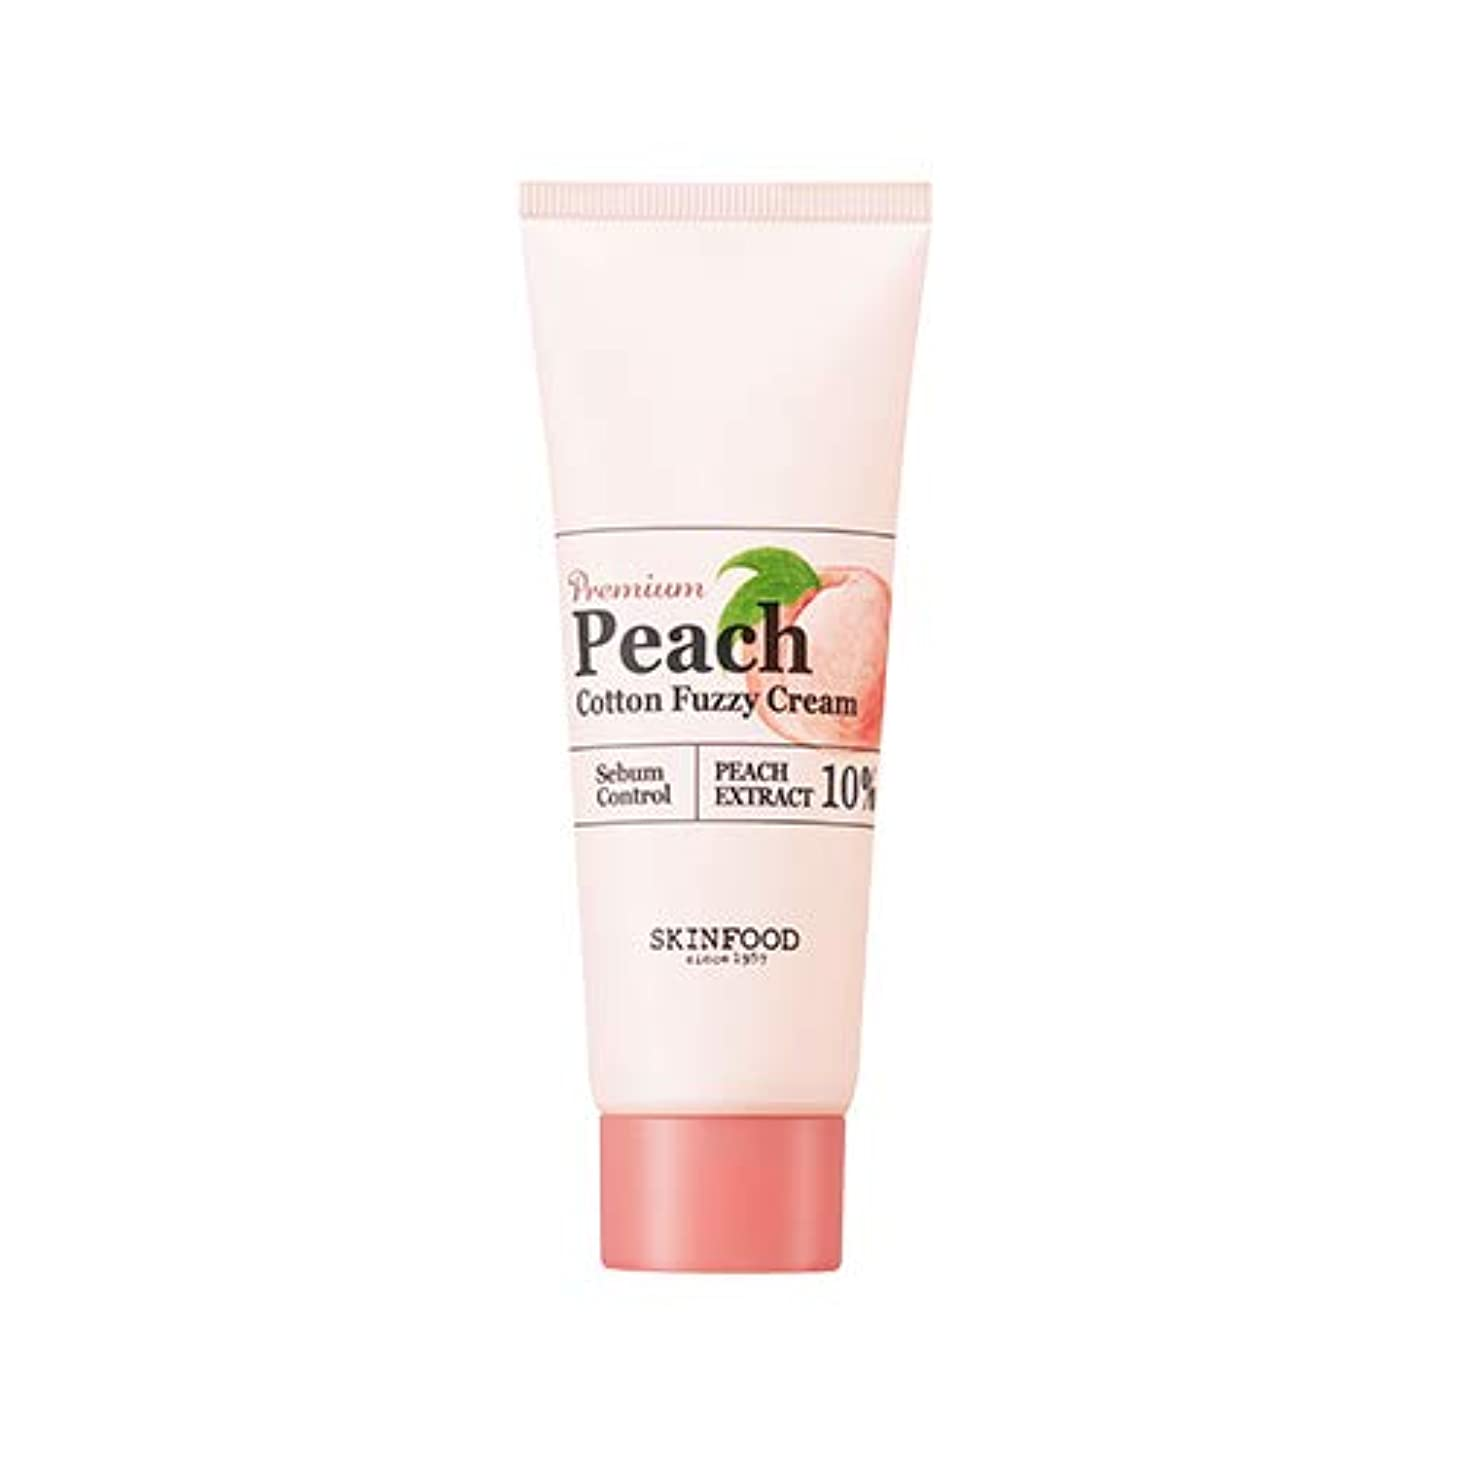 Skinfood プレミアムピーチコットンファジークリーム/Premium Peach Cotton Fuzzy Cream 65ml [並行輸入品]